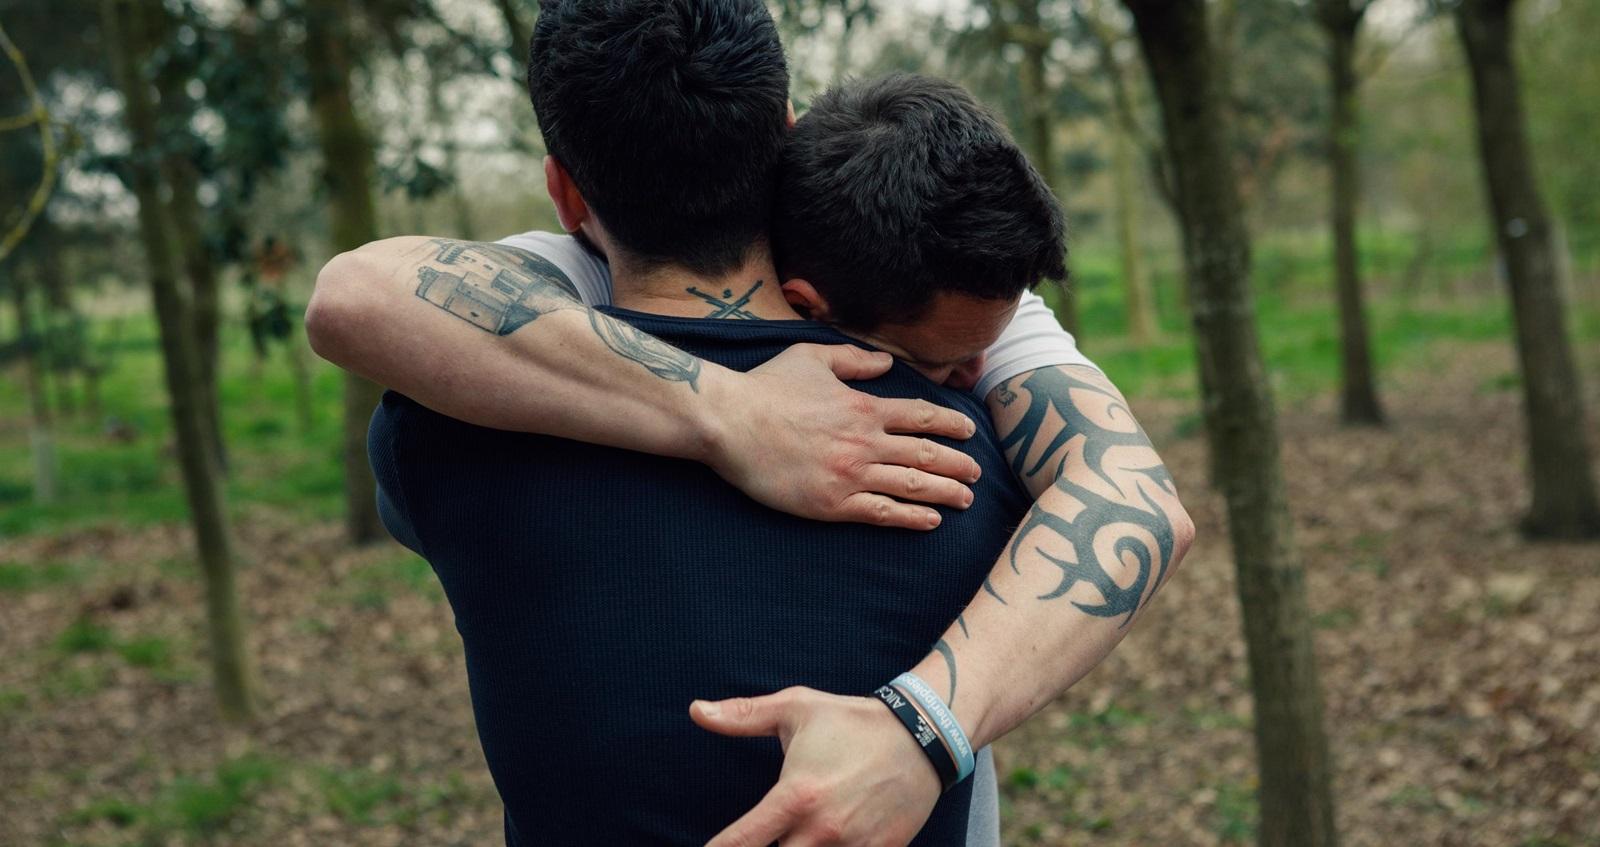 Dan Arnold and Stephen James hugging